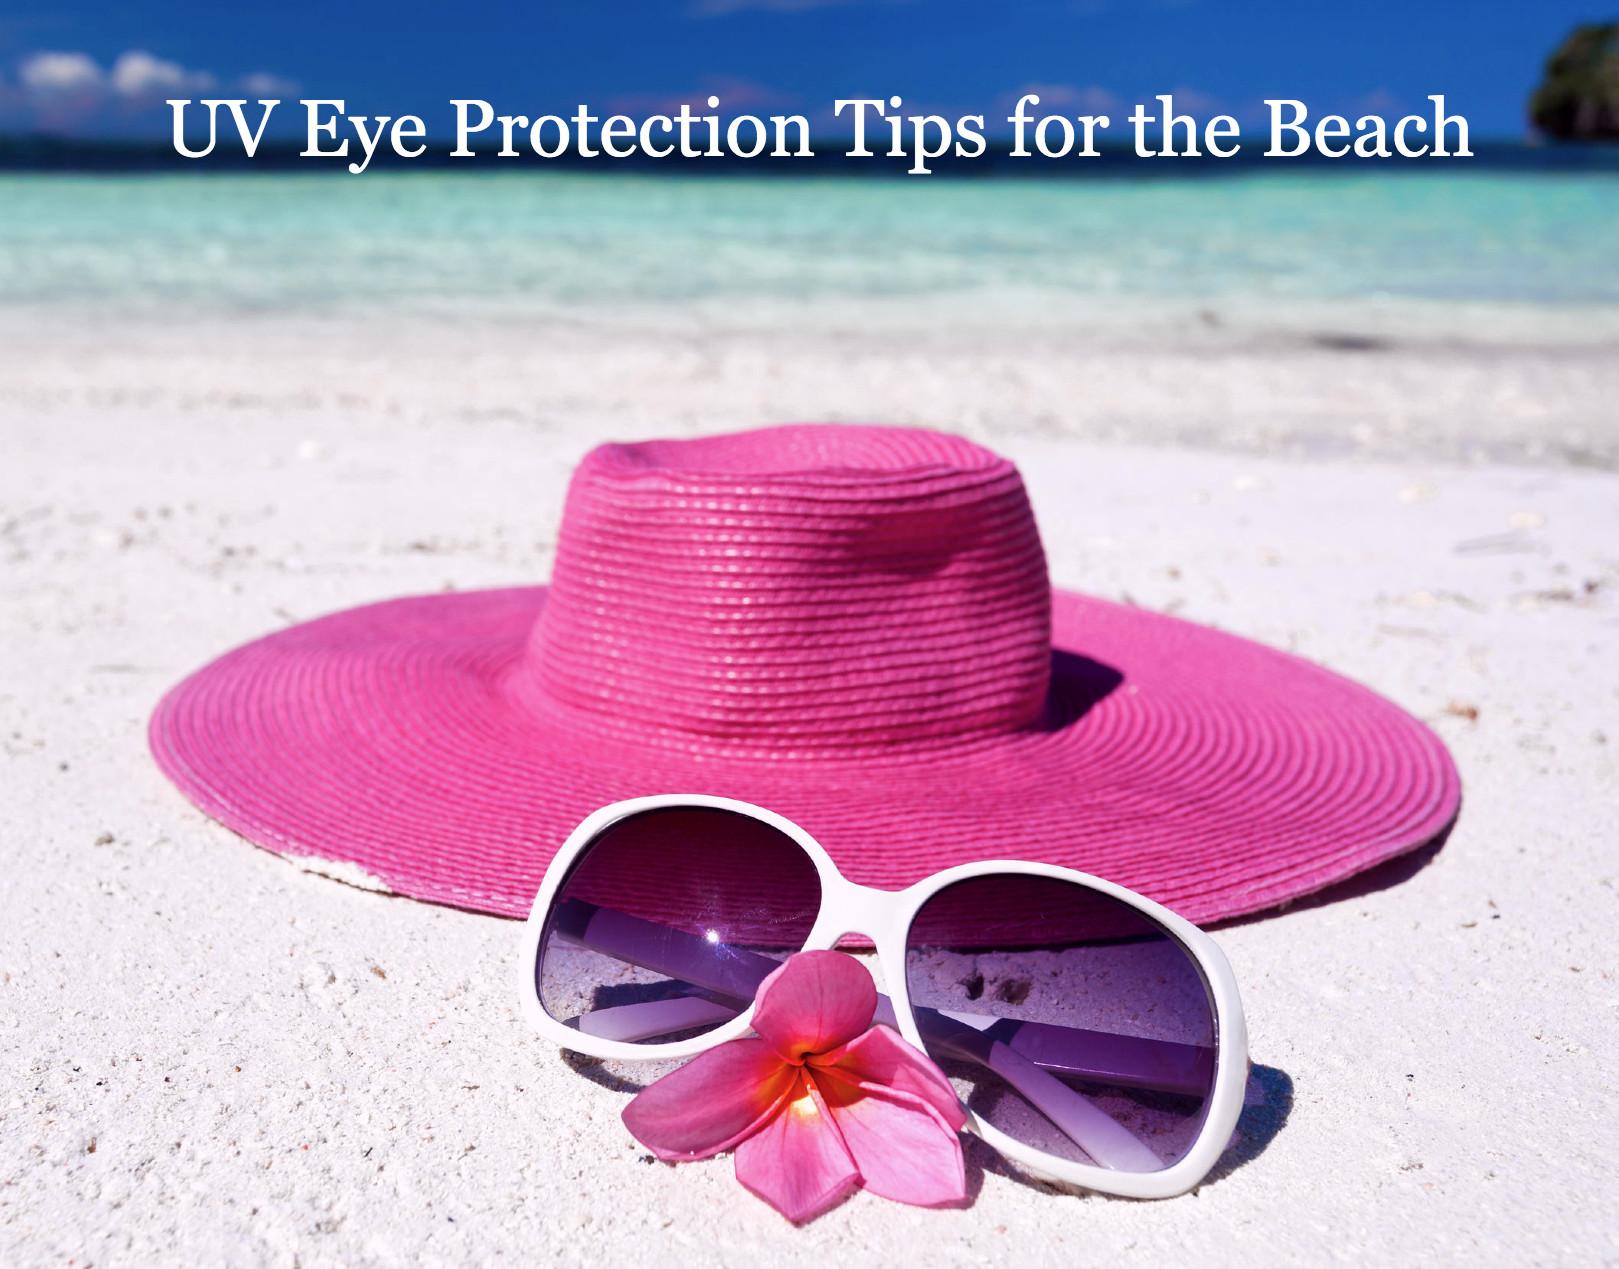 uv eye protection tips for the beach